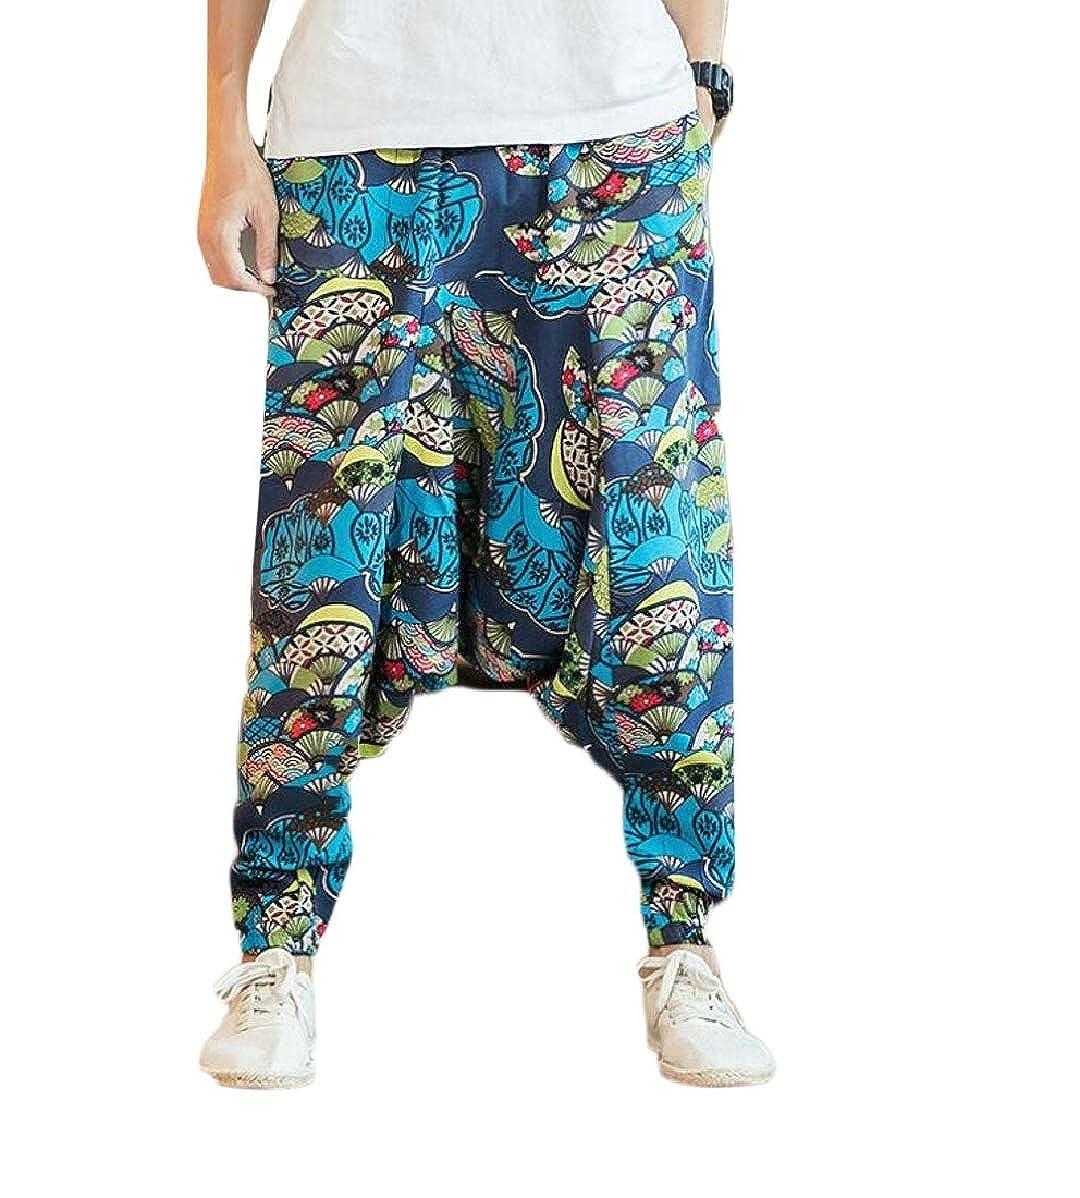 YIhujiuben Mens Smocked Waist Harem Boho Pants Floral Rayon Print Trousers